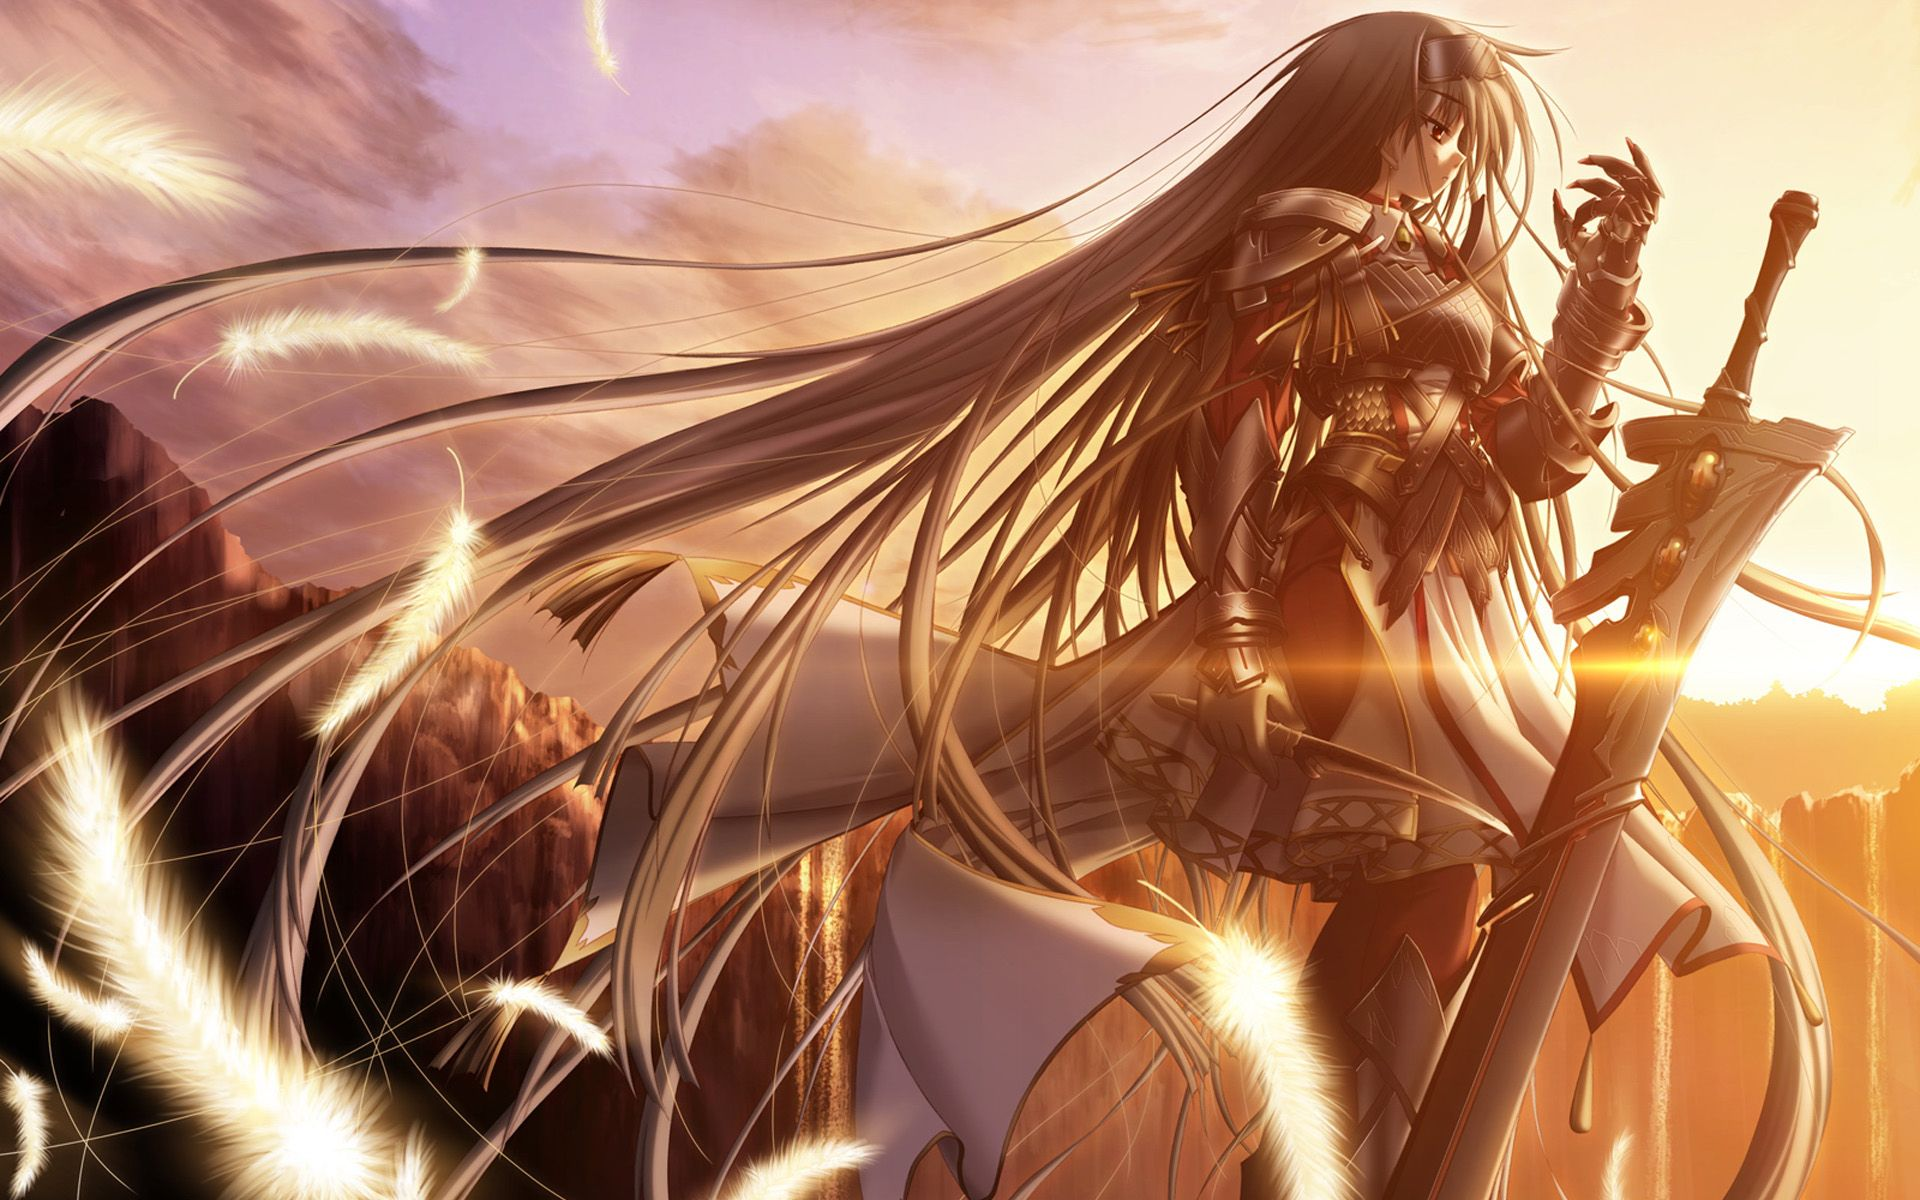 Anime Warrior Wallpaper Hd Dmz Anime Warrior Girl Samurai